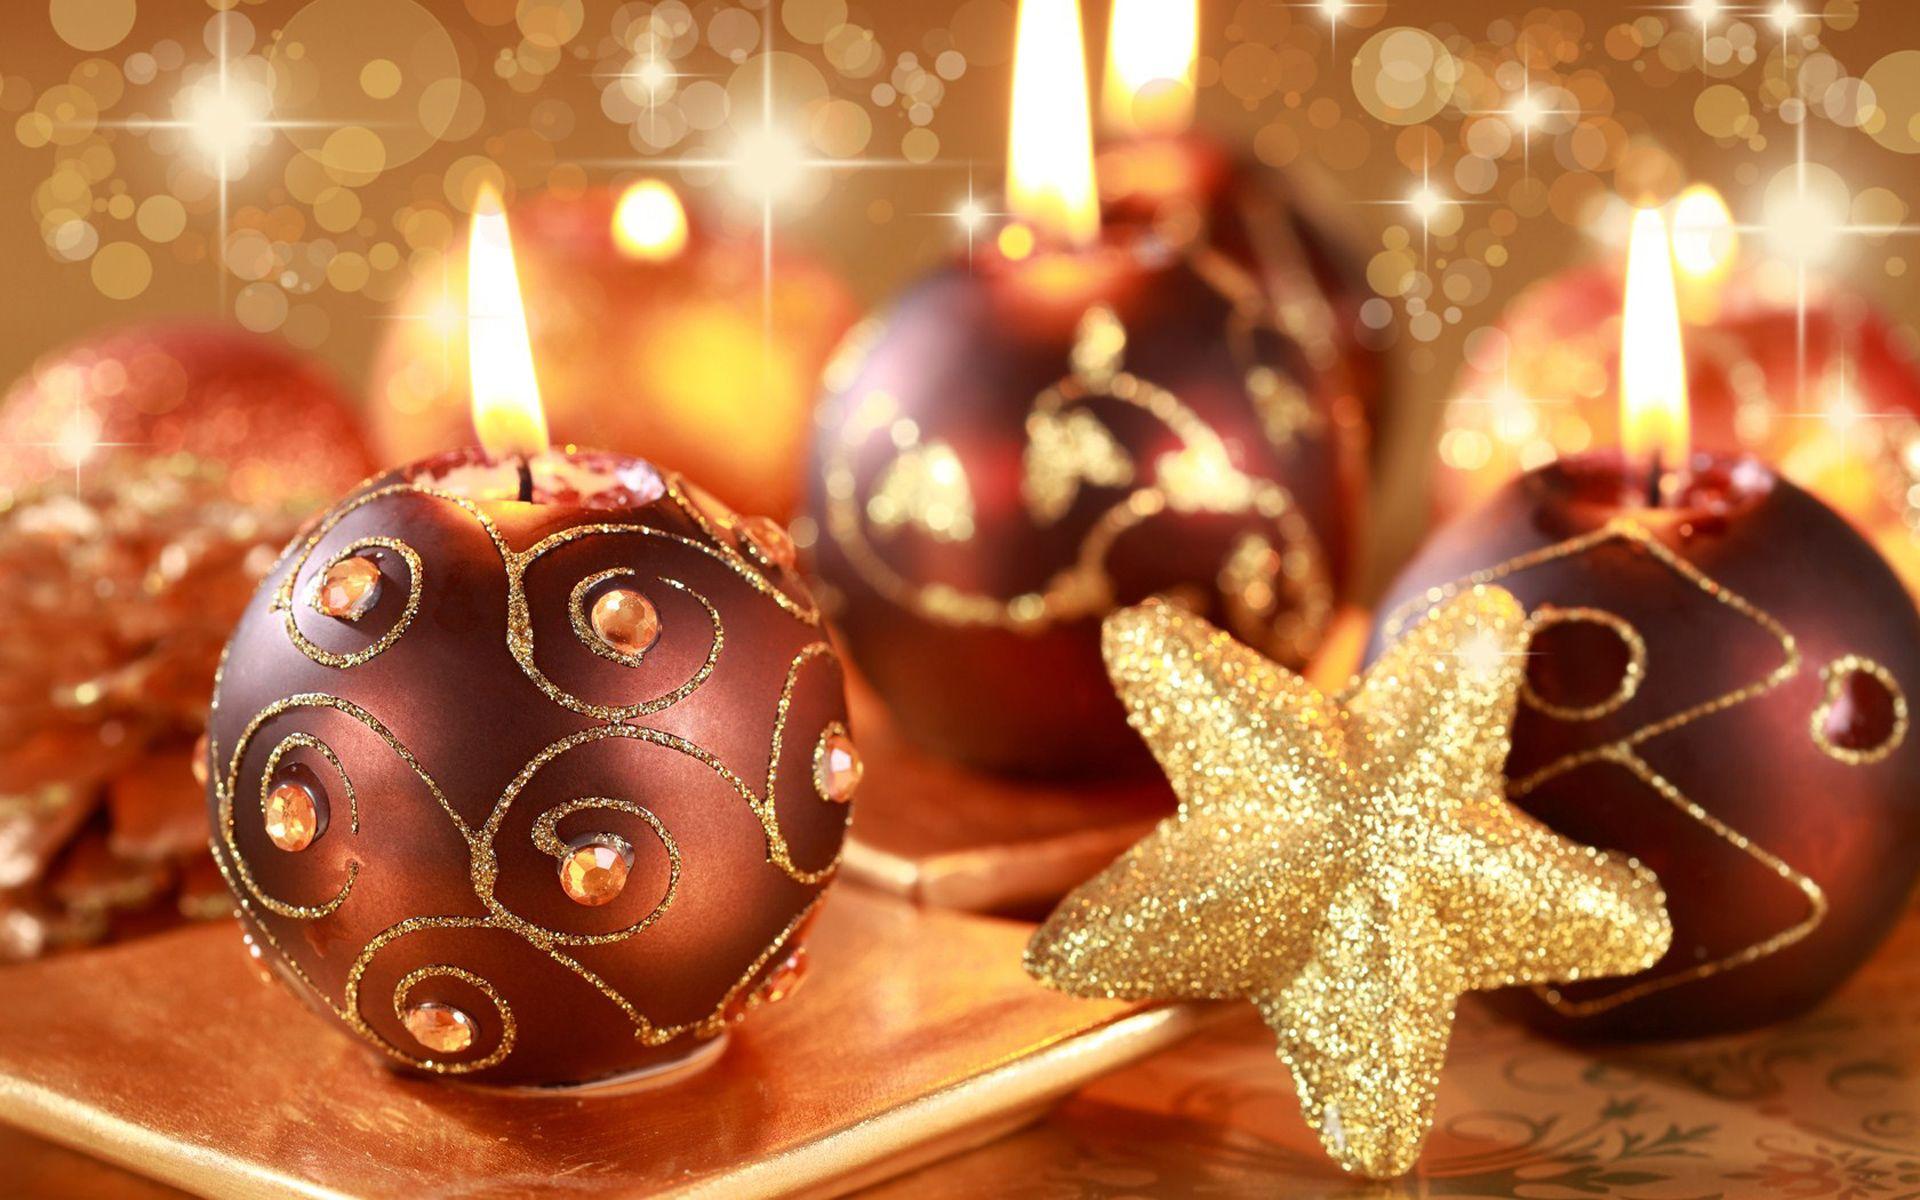 Christmas Candles Free Wonderful Christmas Candle Lights